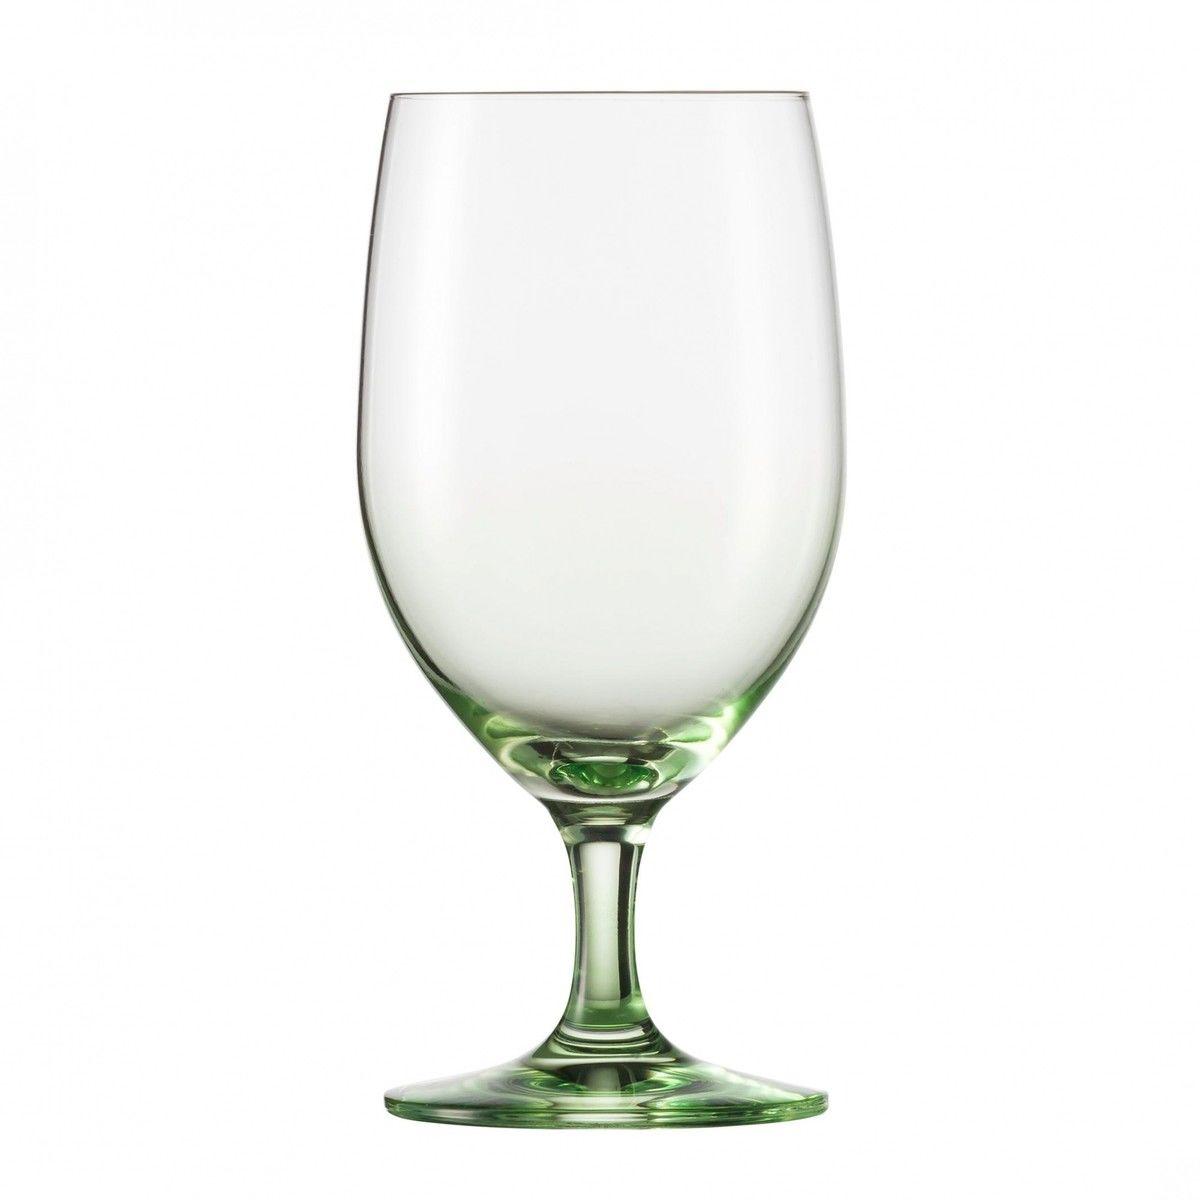 vina touch water glass set of 6 schott zwiesel. Black Bedroom Furniture Sets. Home Design Ideas